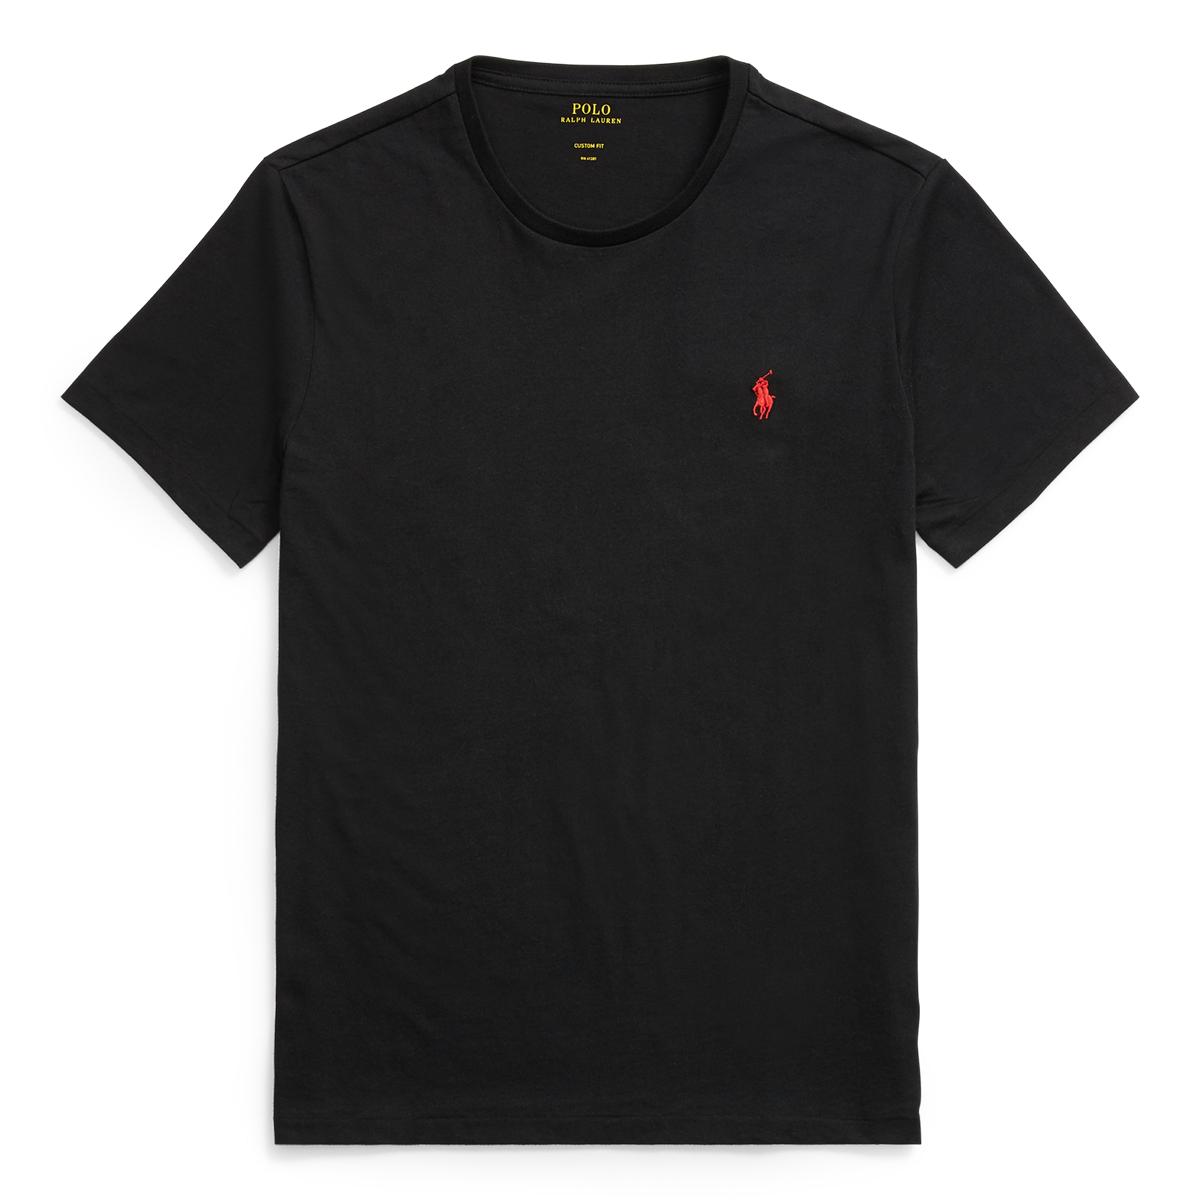 Custom Slim Fit Cotton T-Shirt | Tees T-Shirts & Sweatshirts | Ralph Lauren